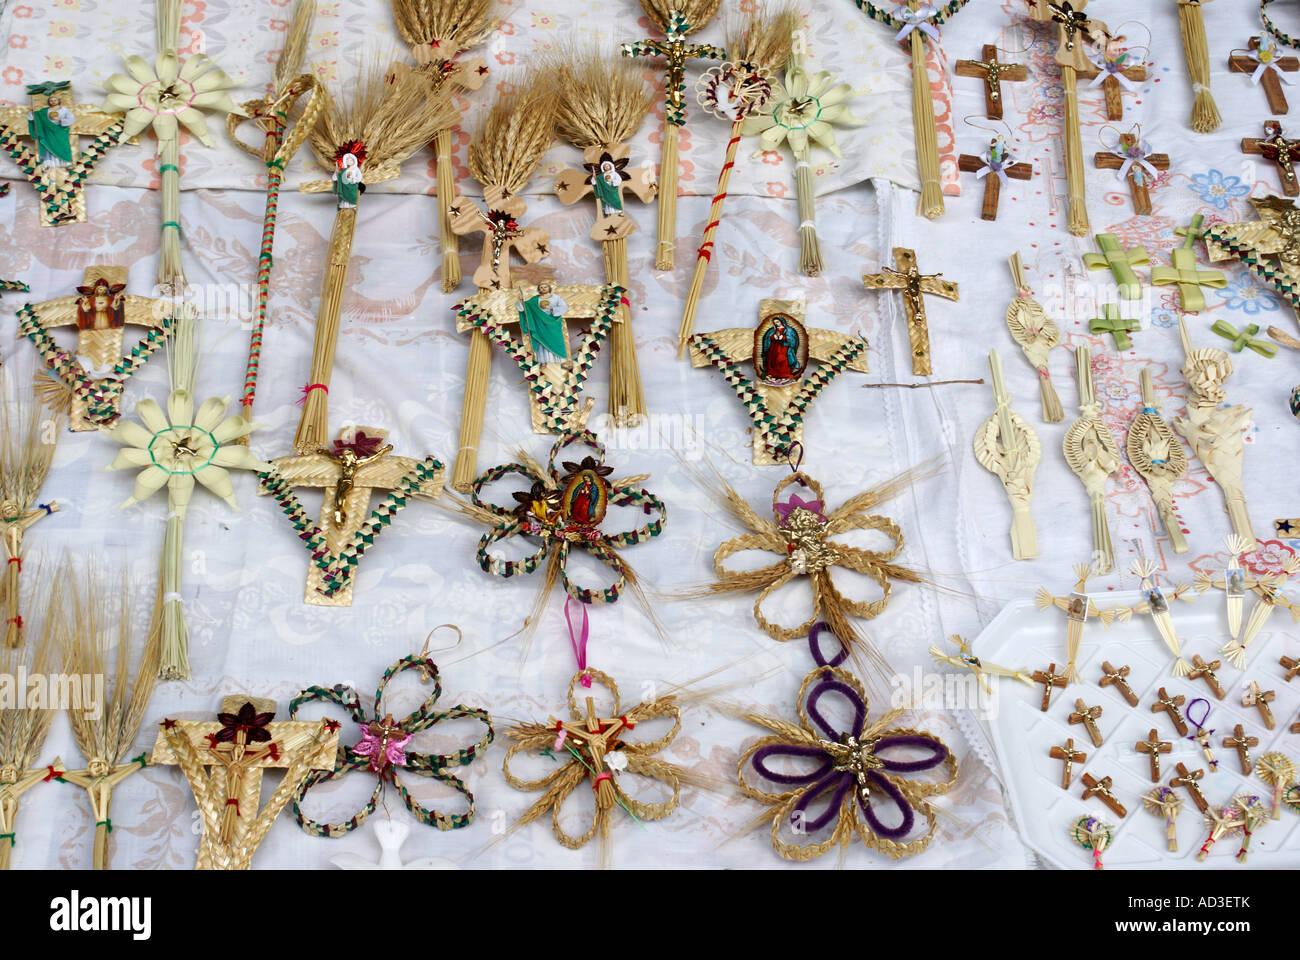 Palm Sunday crosses for sale during Semana Santa, Mexico City - Stock Image